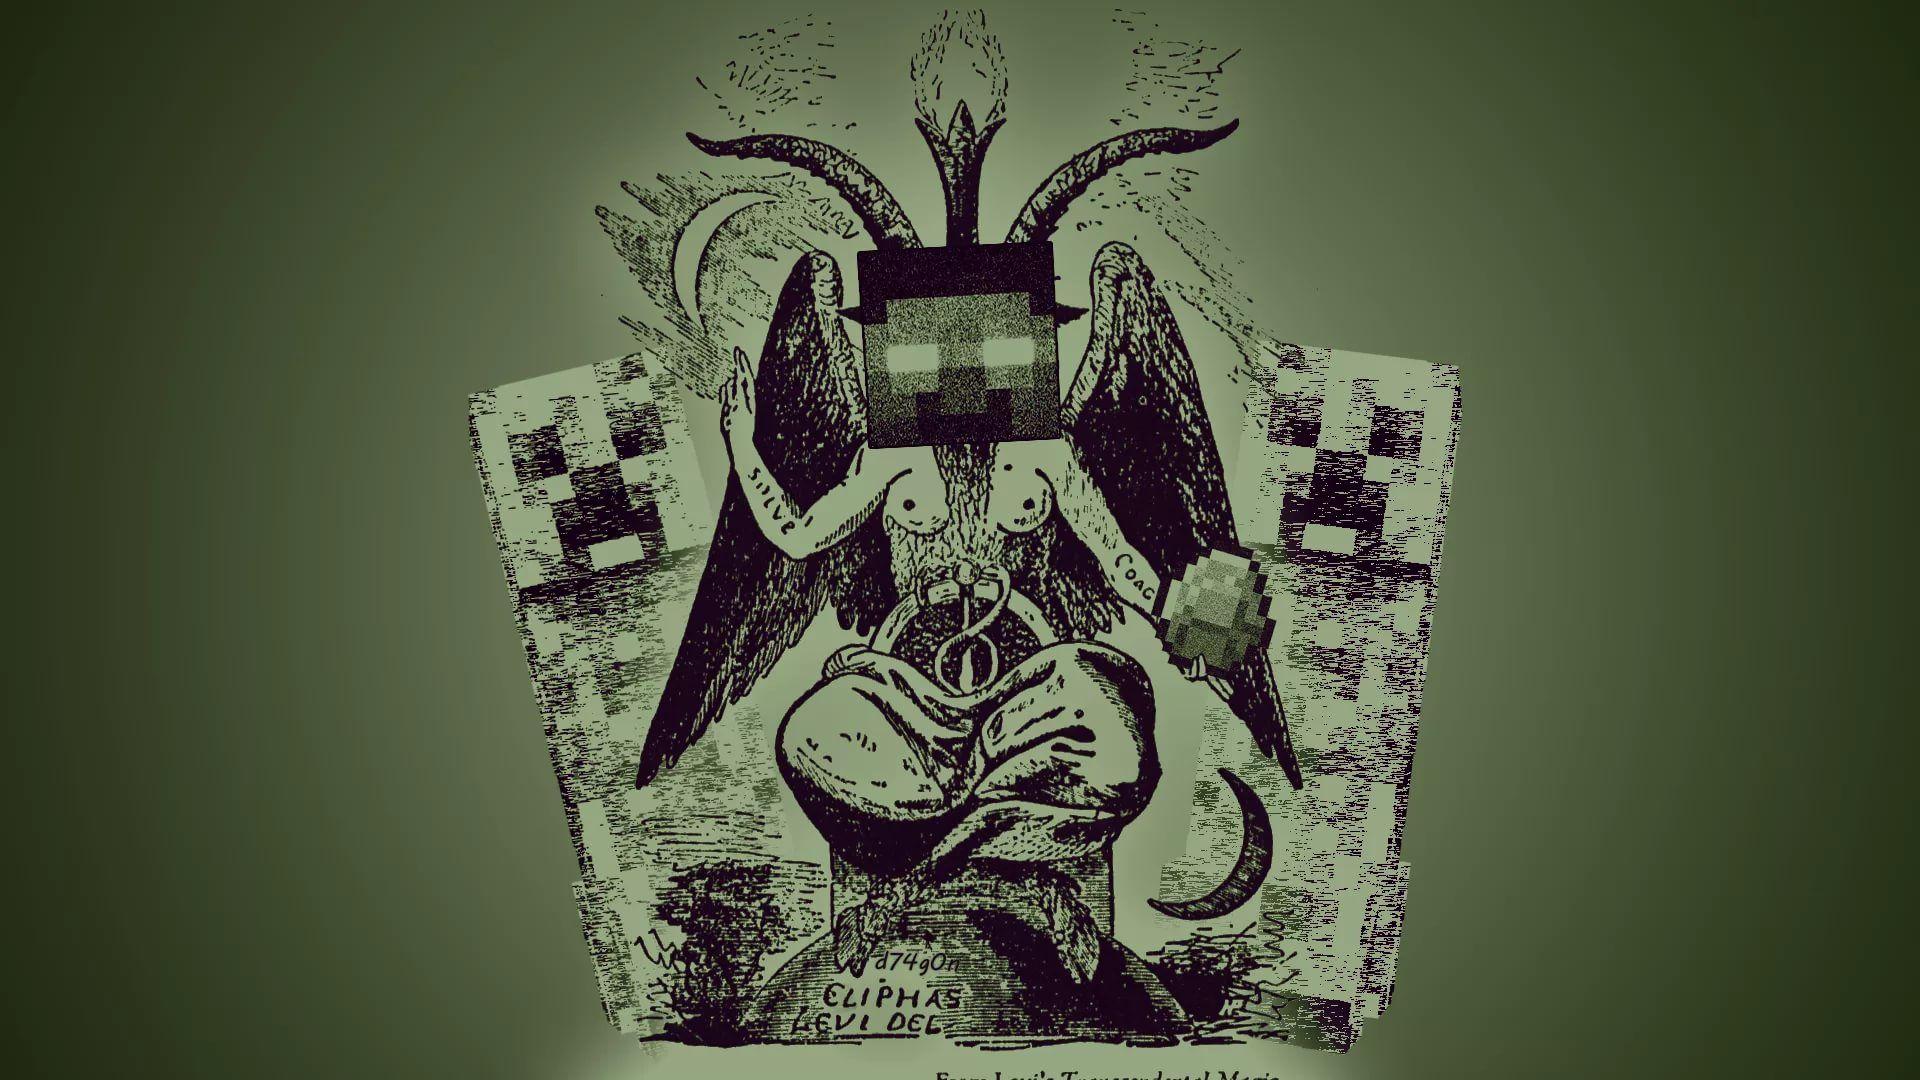 Satanic new wallpaper